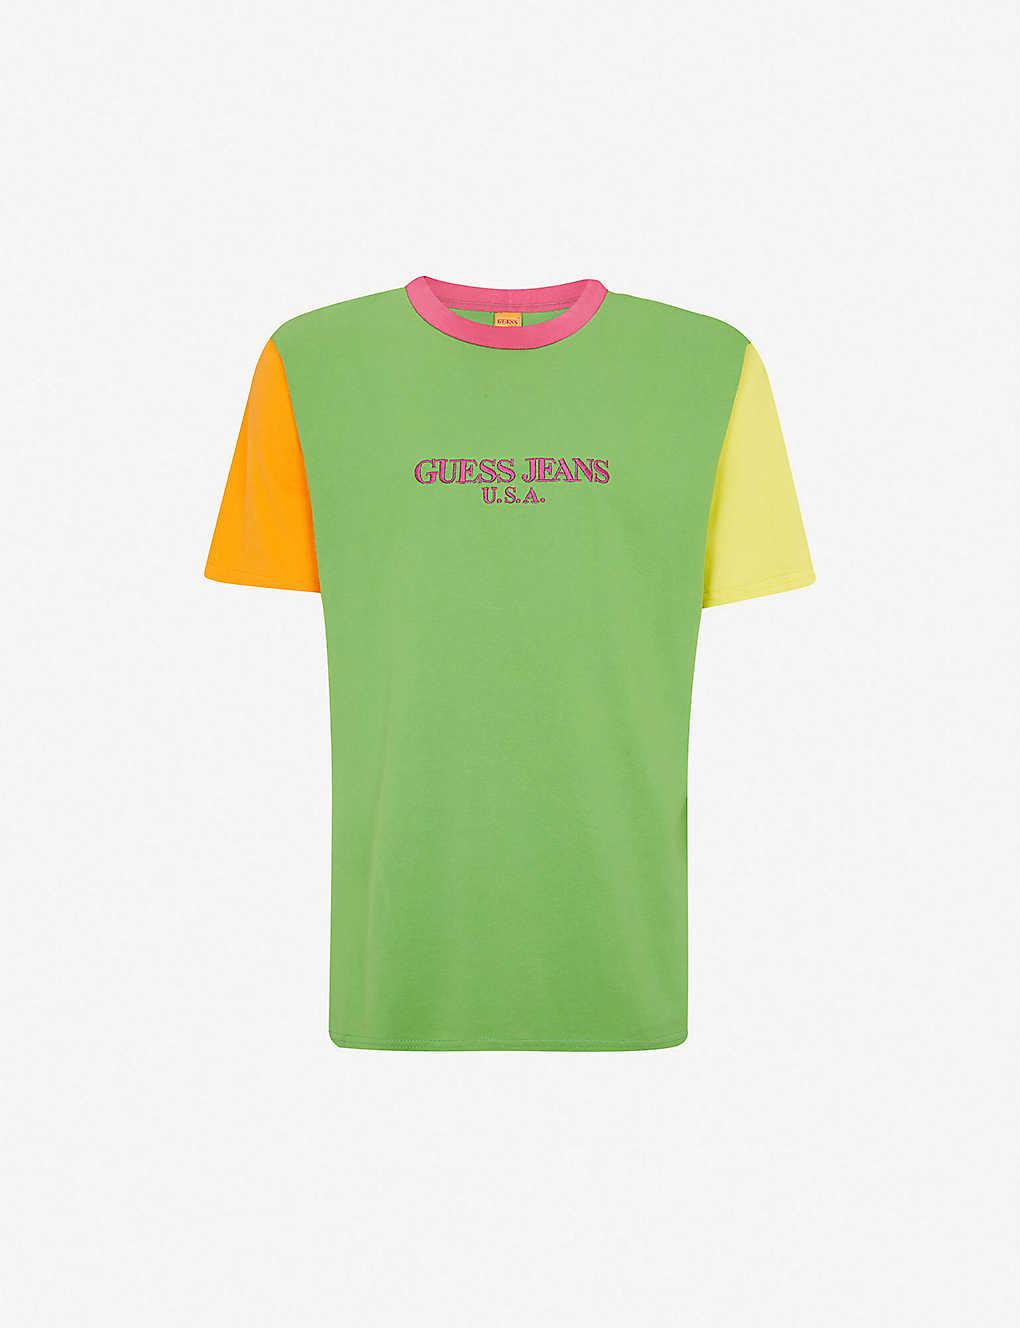 GUESS JEANS USA - Farmers Market colour-blocked cotton-jersey T ... 5b12d106f43b